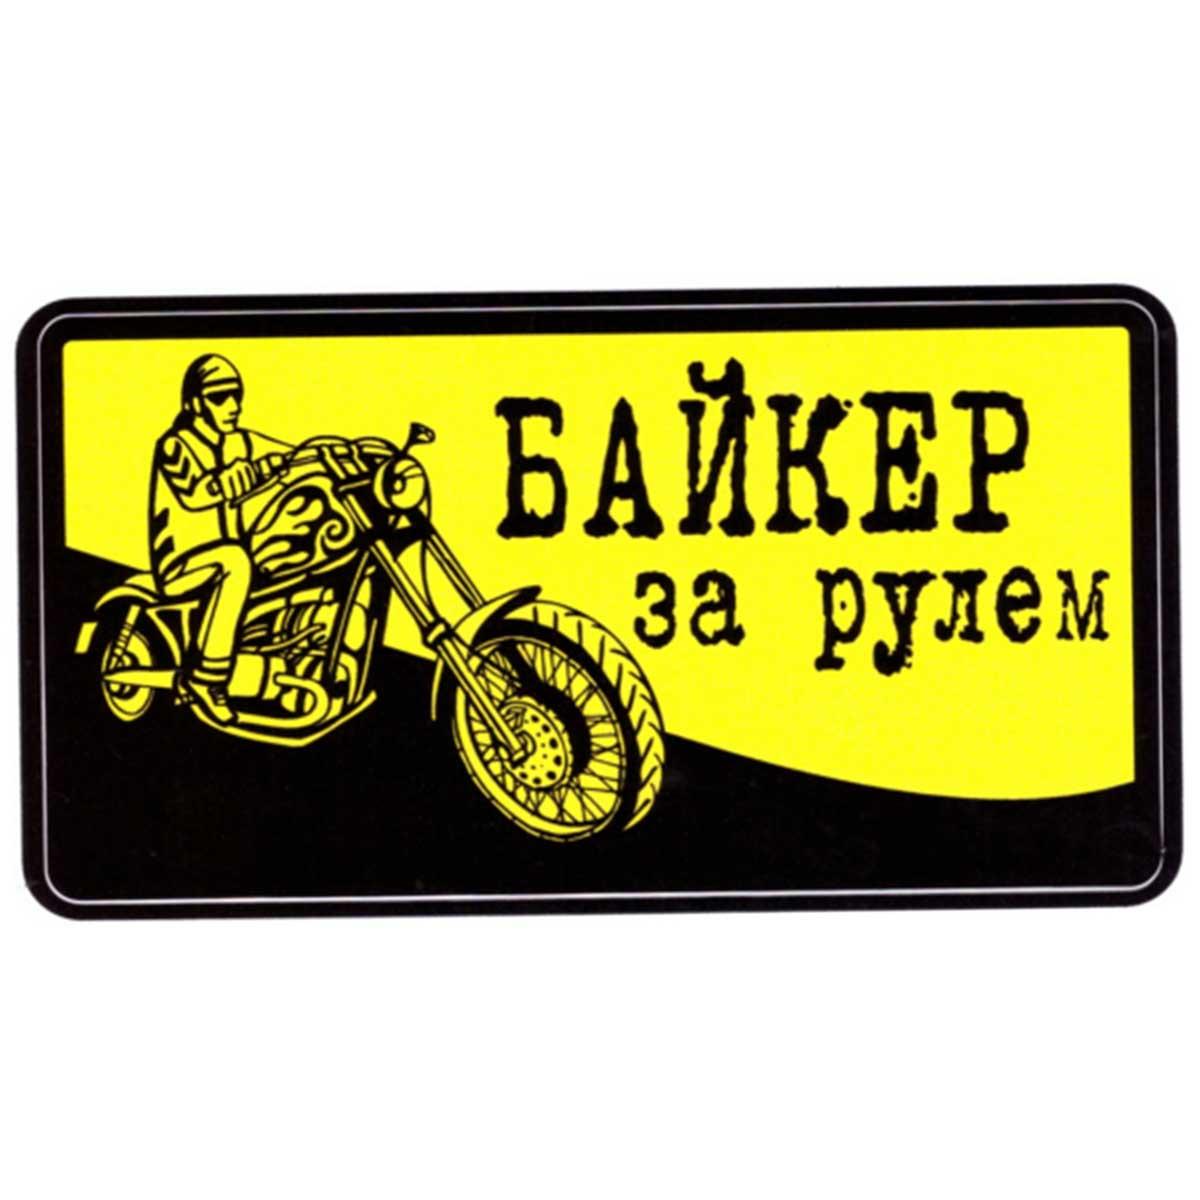 Фото - Наклейка на автомобиль Байкер за рулемвиниловая 15х15 наклейка инвалид в авто двухсторонняя 15х15 см